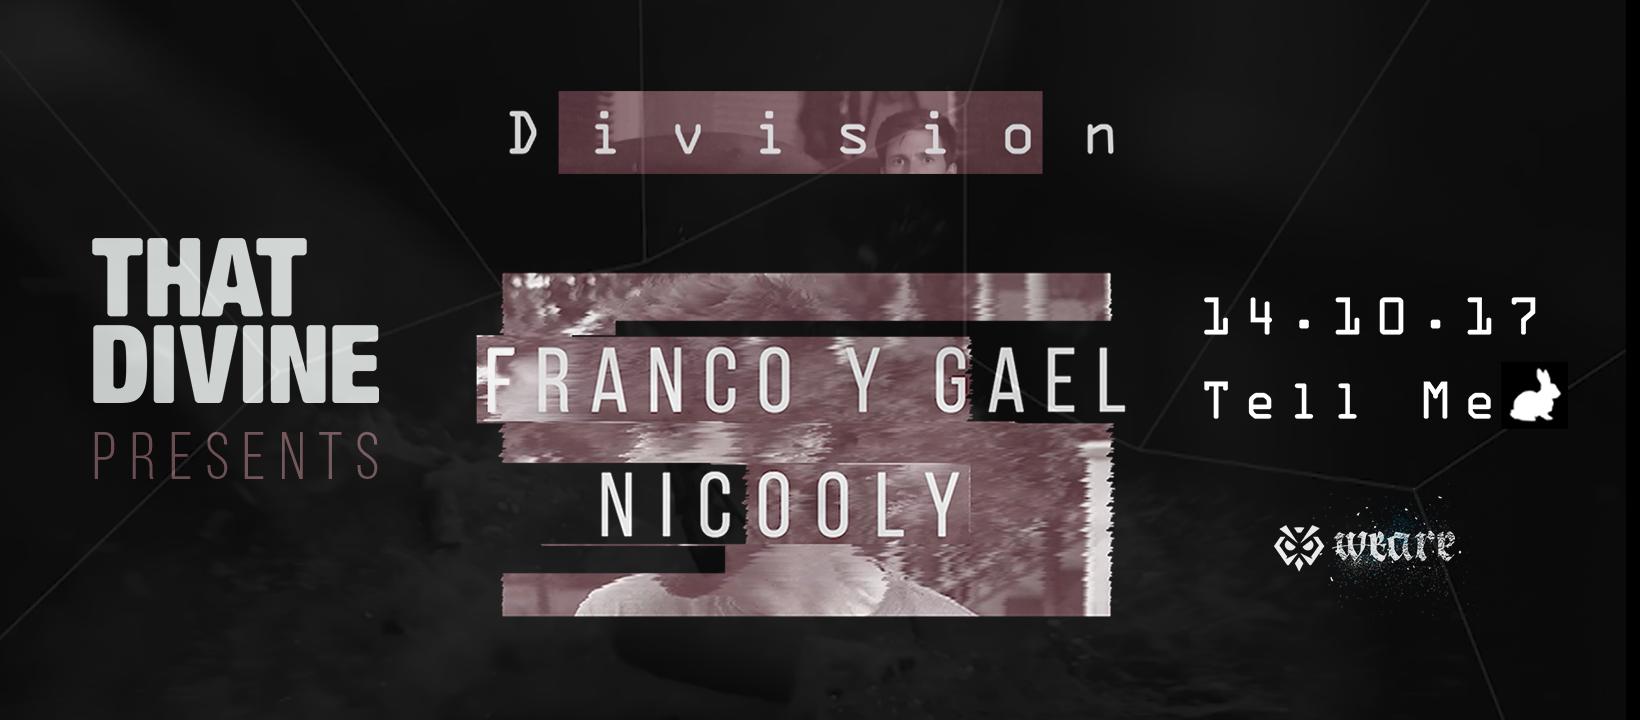 That Divine pres. Division w/ Franco y Gael & Nicooly